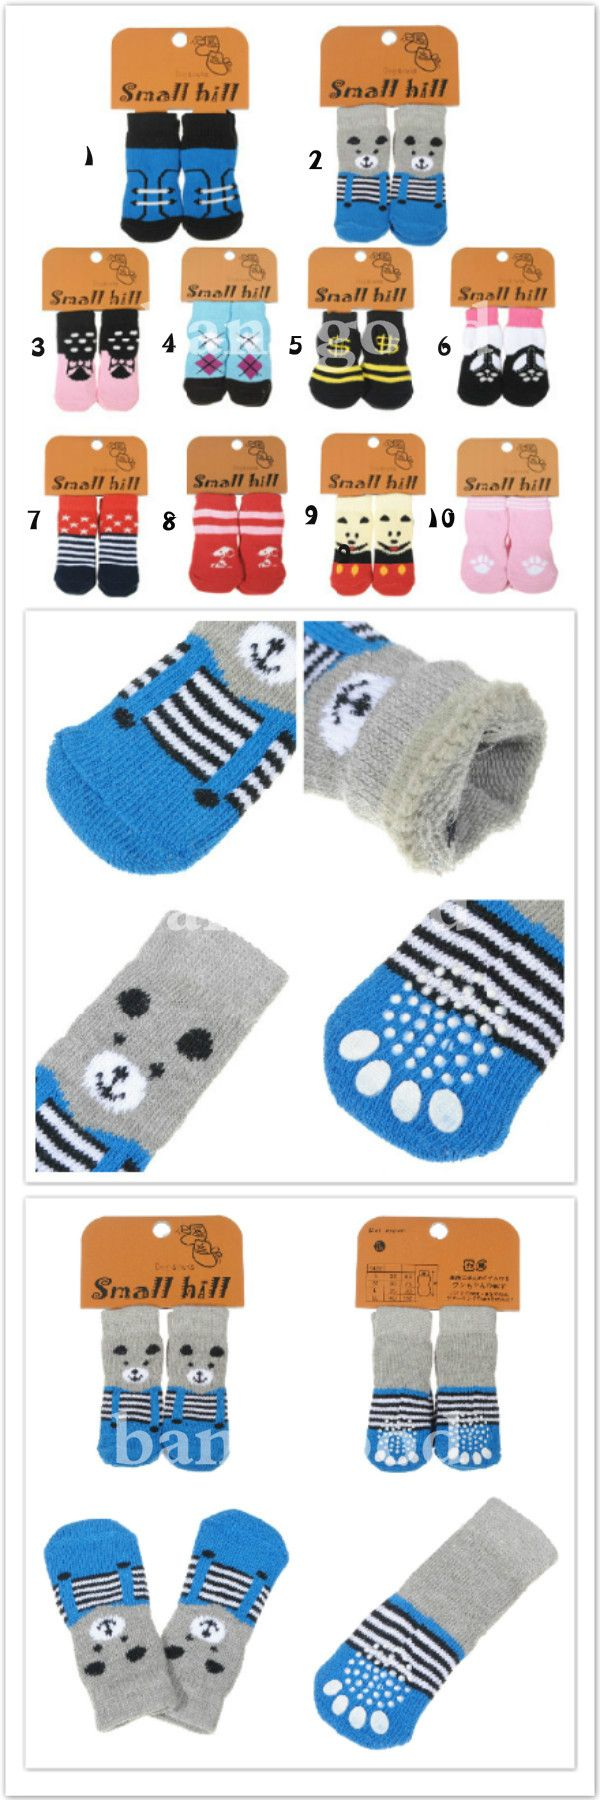 4pcs/1Set Indoor Pet Dogs Cats Lovely Cotton Socks Anti-slip S/M/L Banggood £1.50